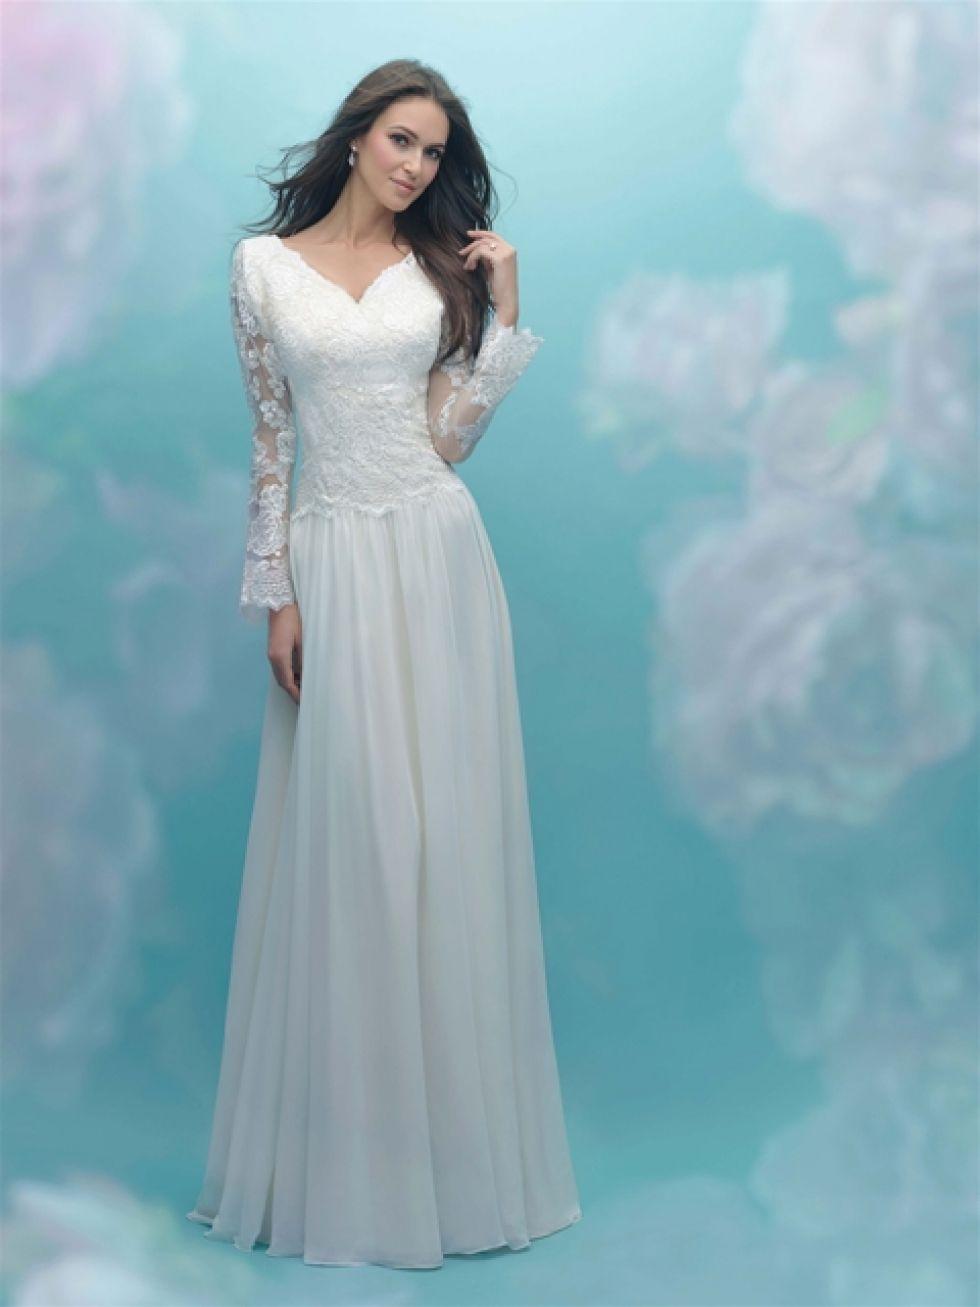 Modest wedding dress with dropped waist, english net skirt, v neck ...